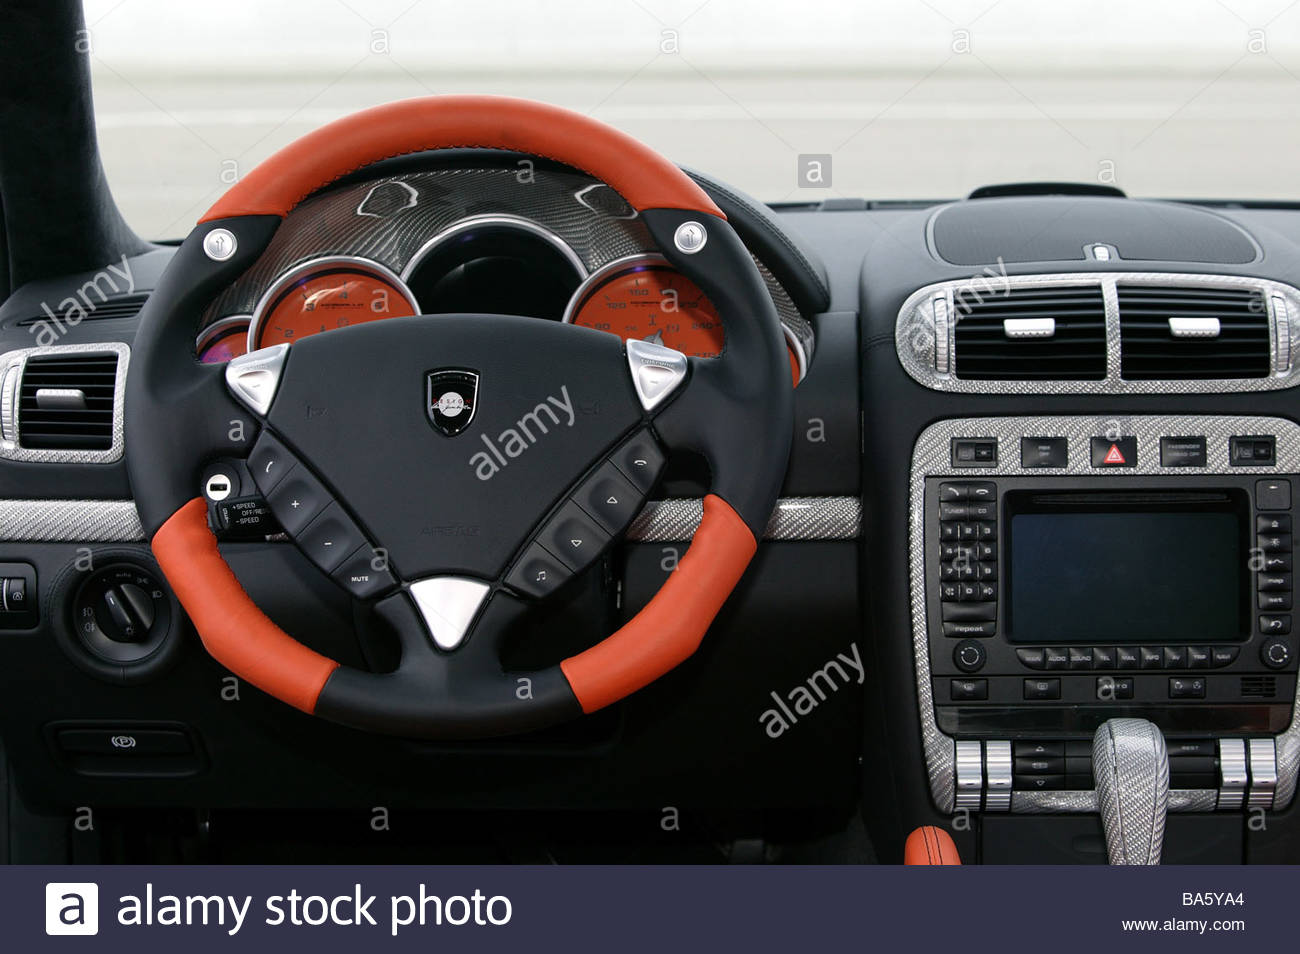 Car porsche cayenne gemballa gt 750 inner opinion detail cockpit steering wheel no property release